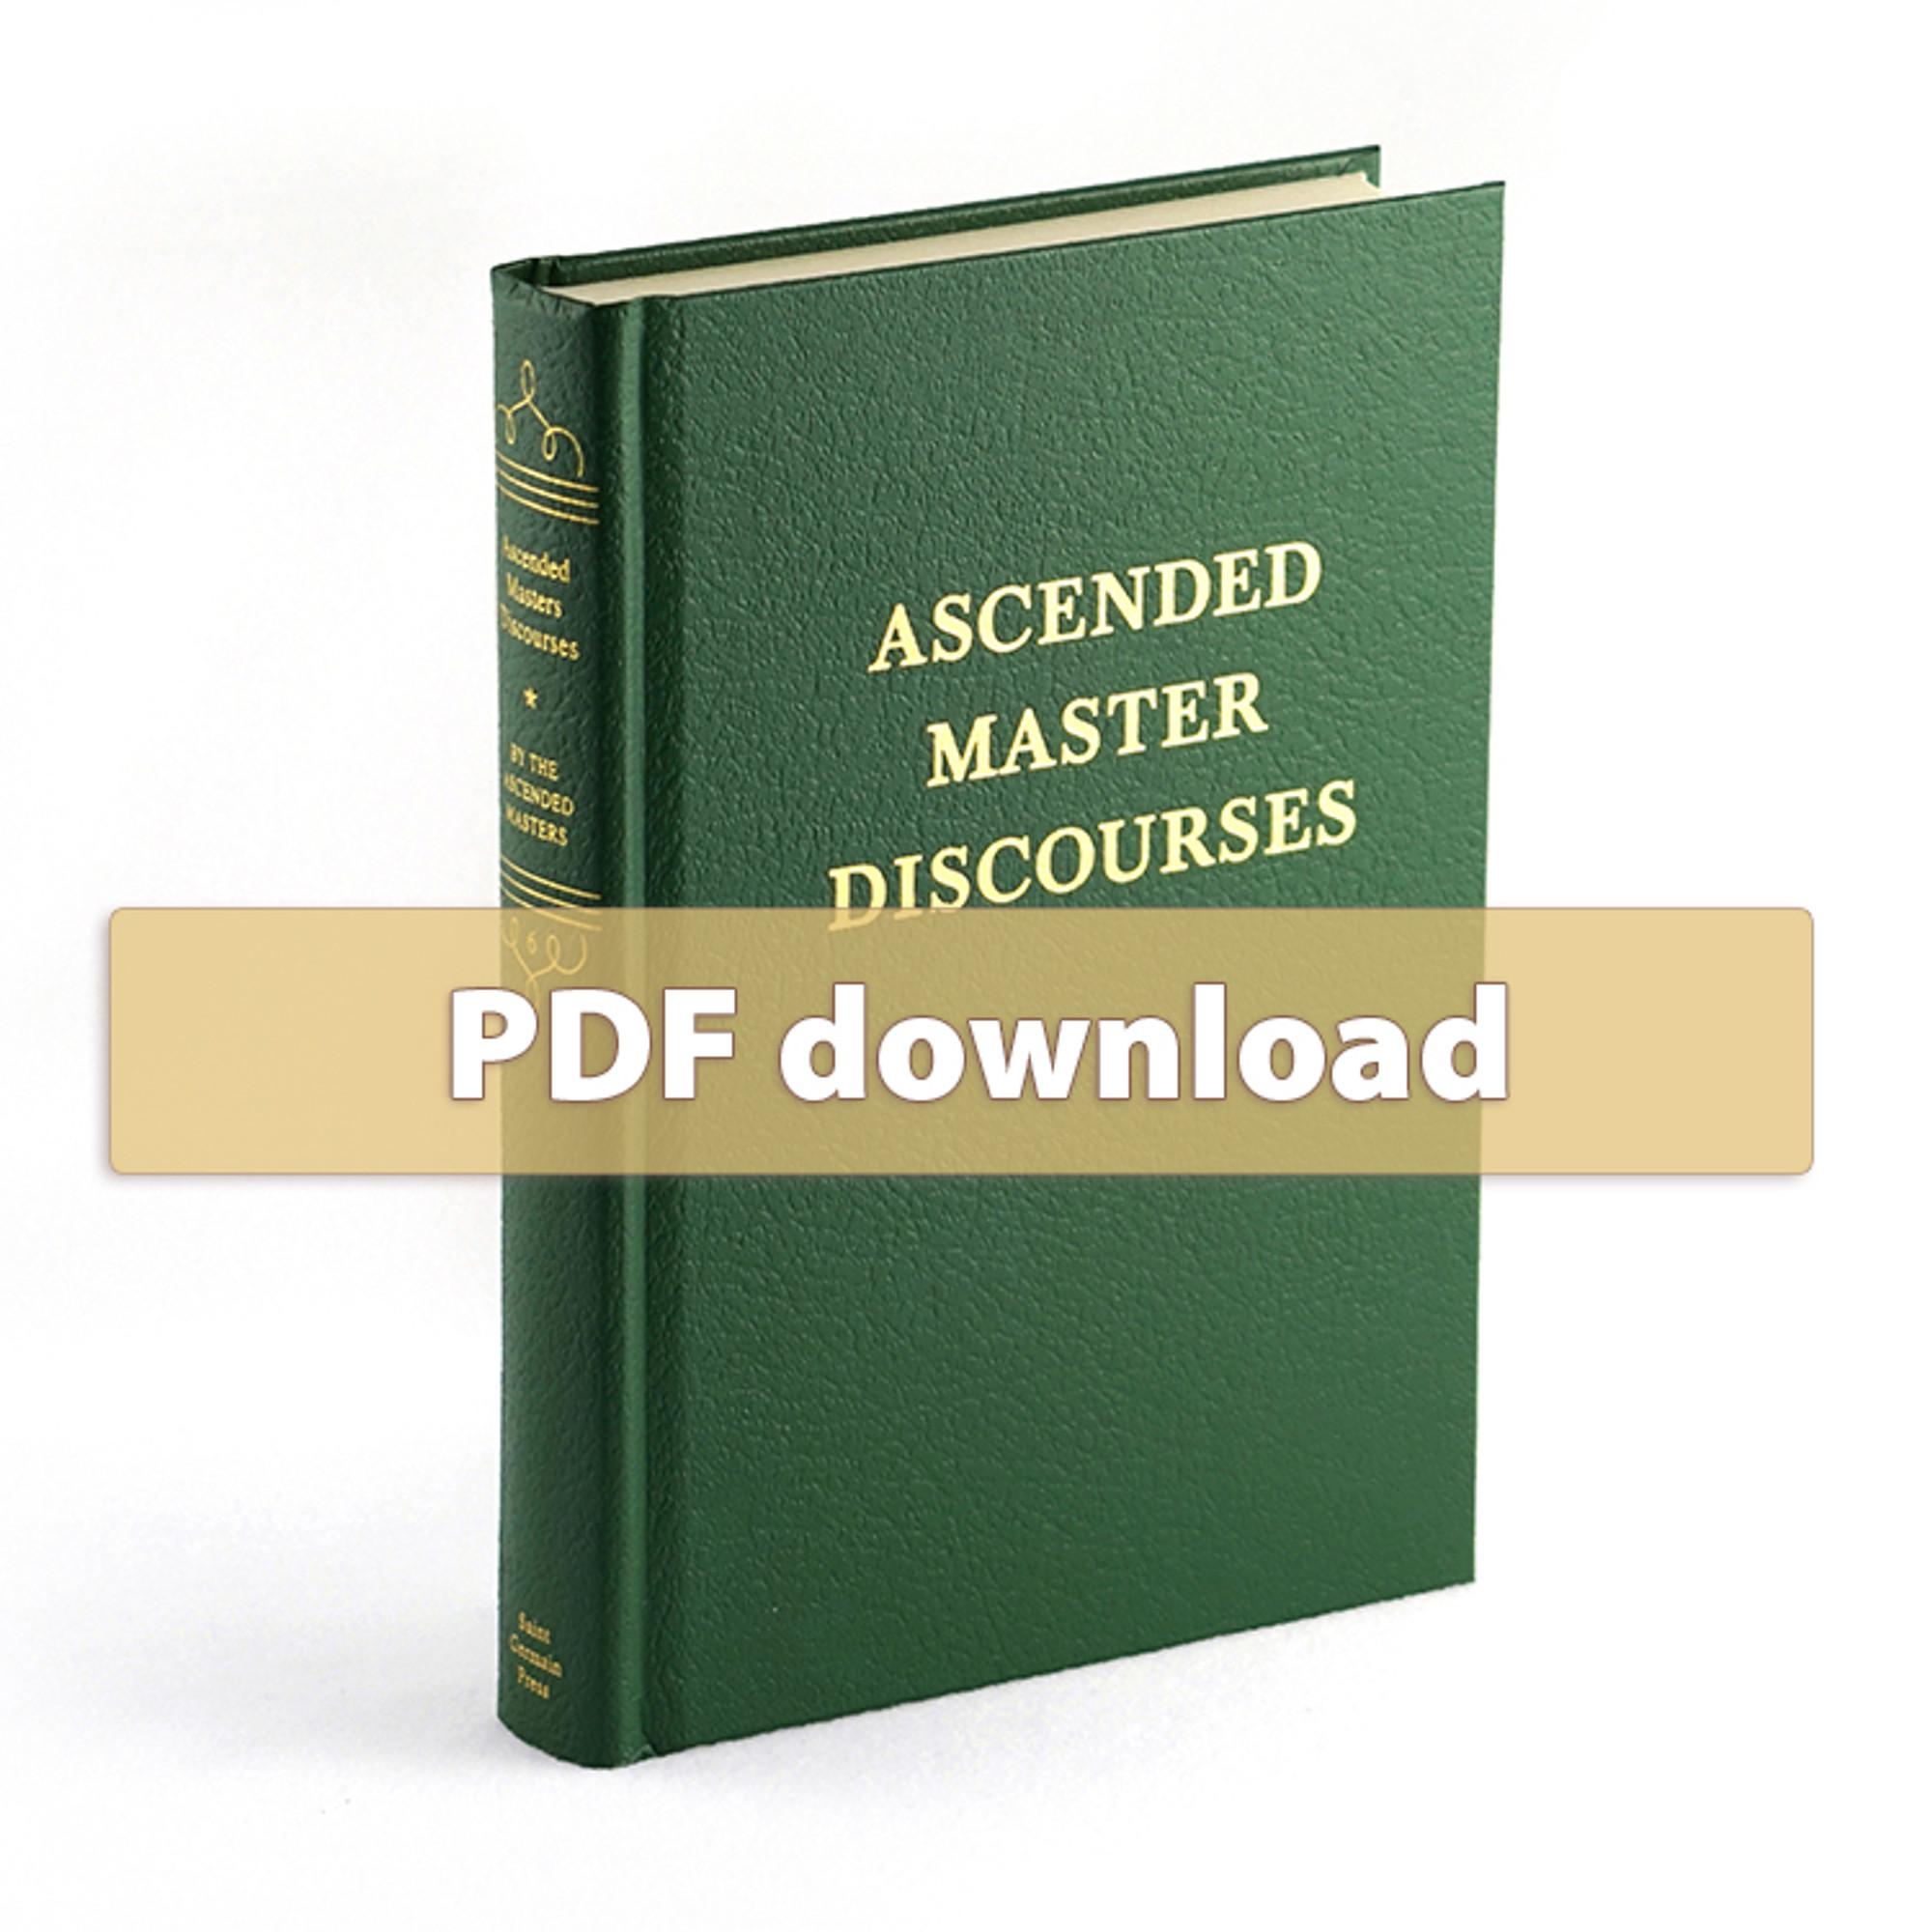 Volume 06 - Ascended Master Discourses - PDF